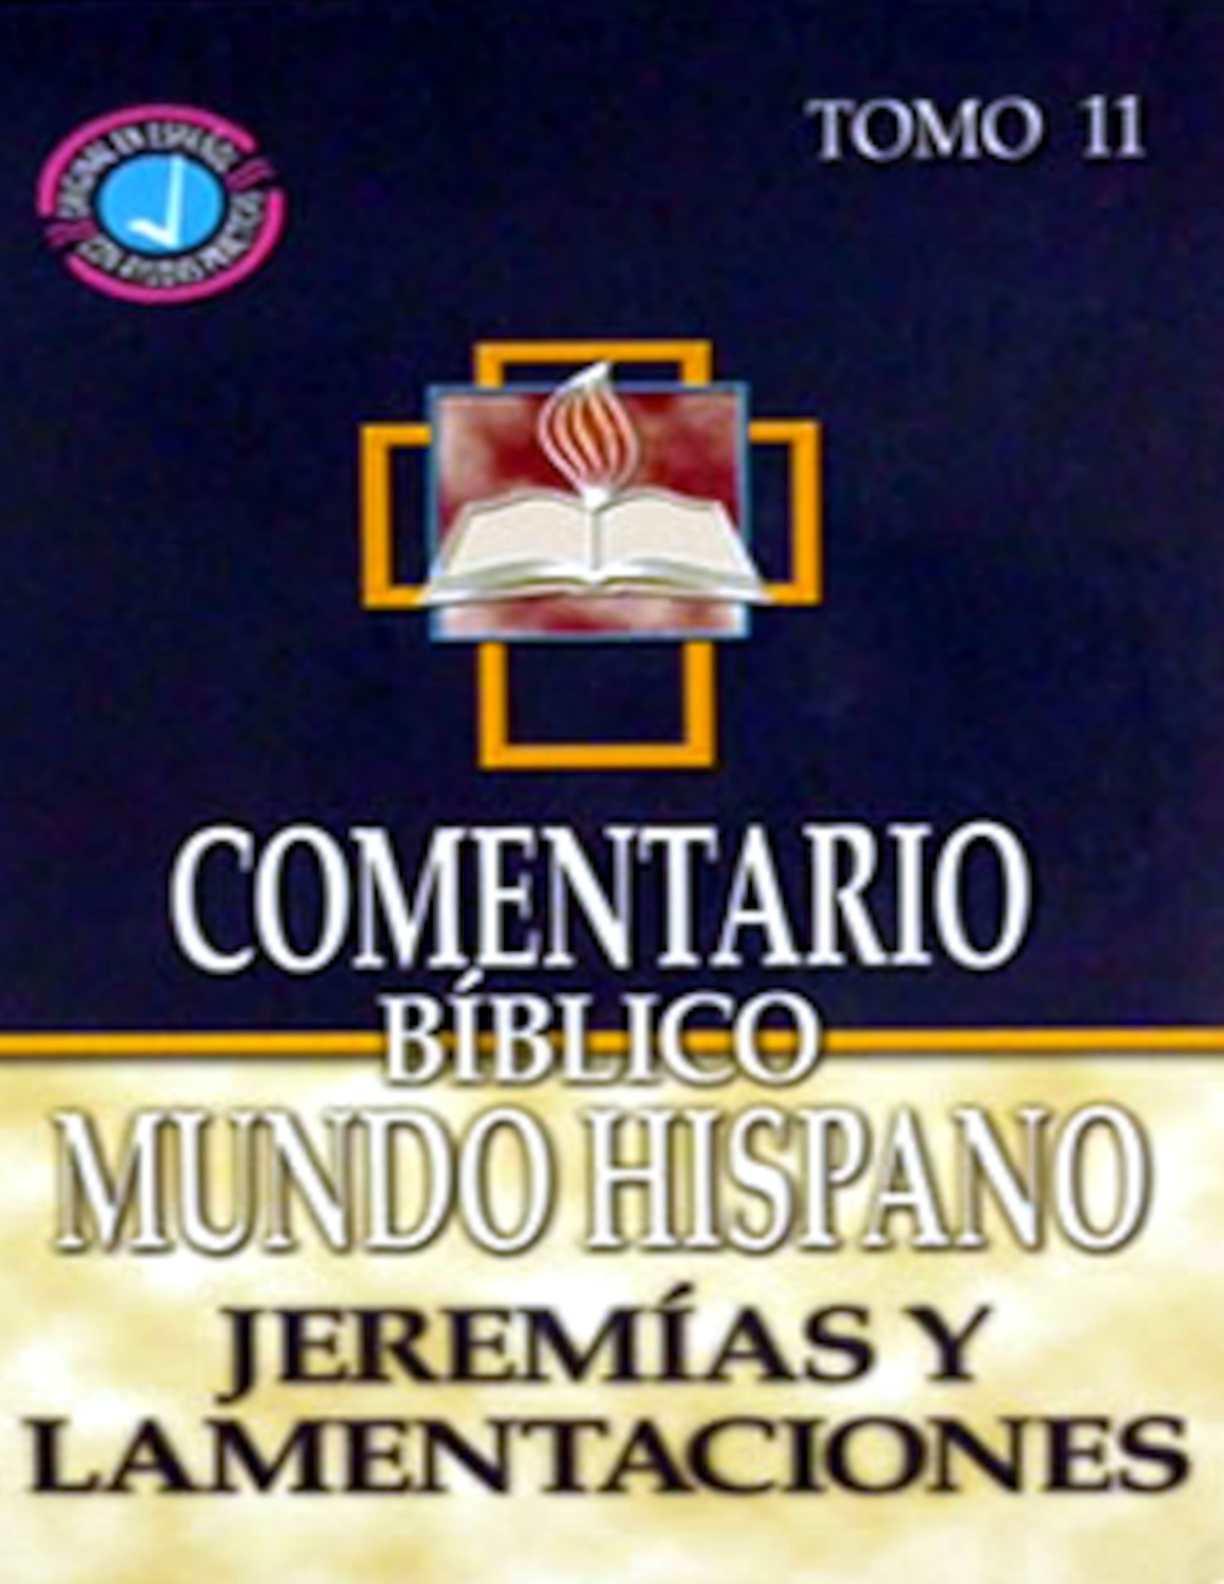 Calam O Comentario B Blico Mundo Hispano Tomo 11 Jerem As Y